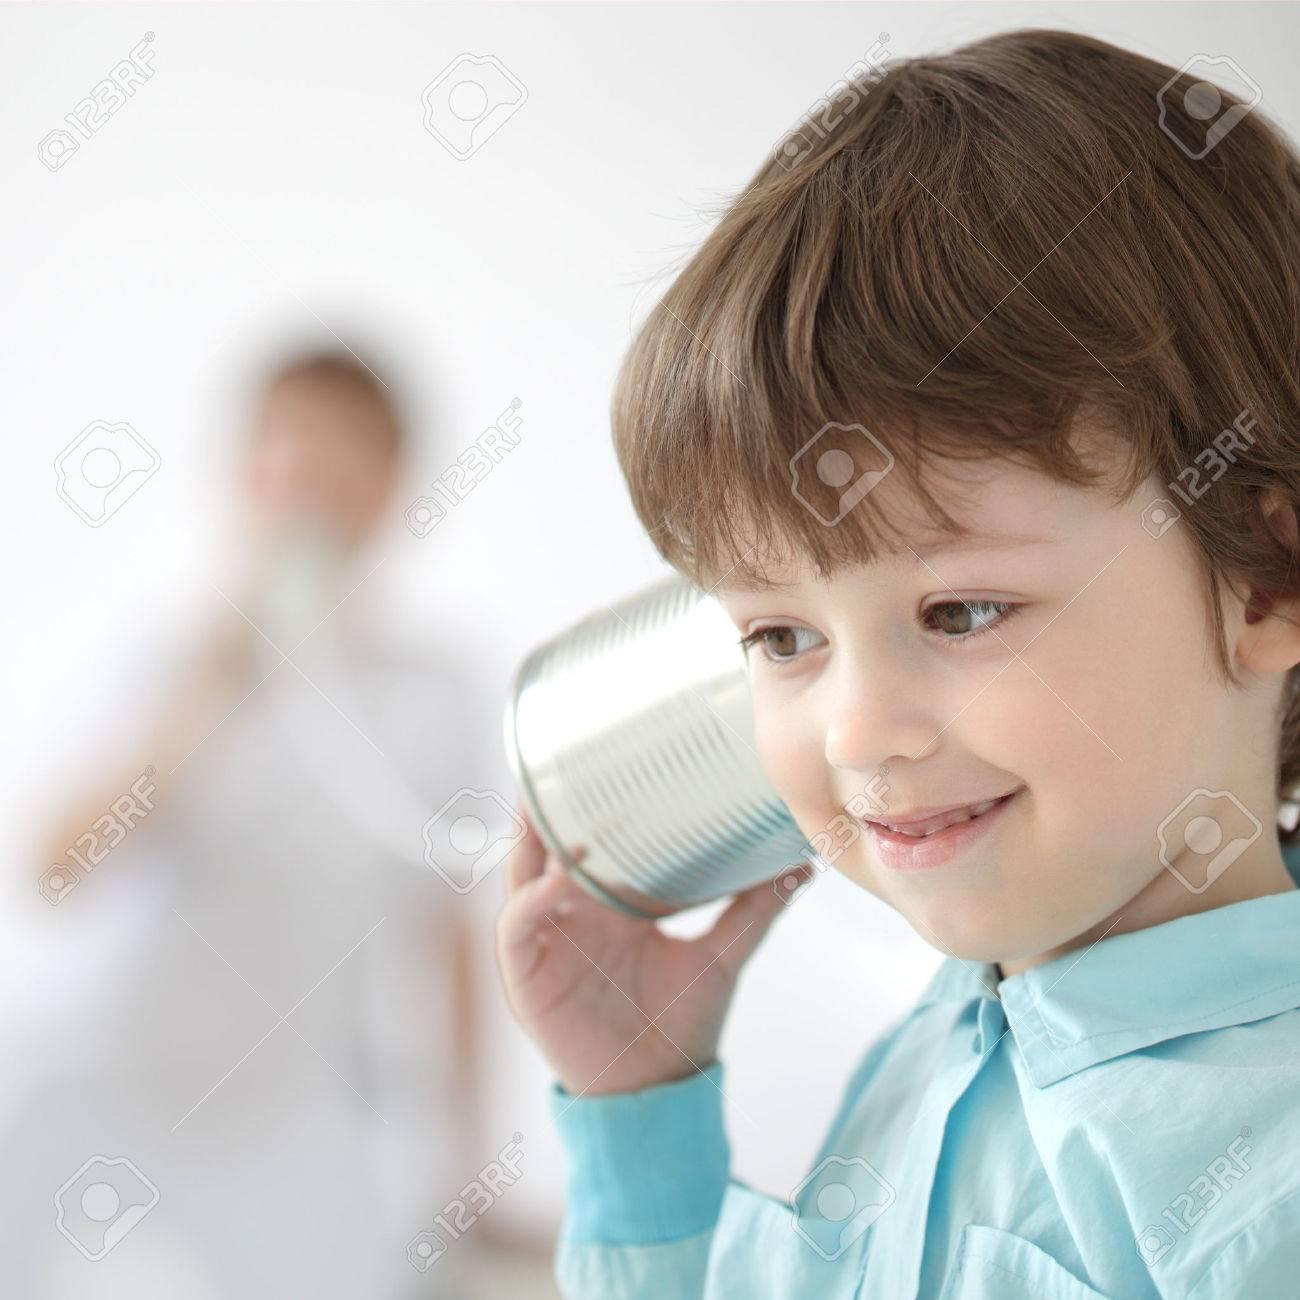 beauty boy listen tin can telephone - 23807378